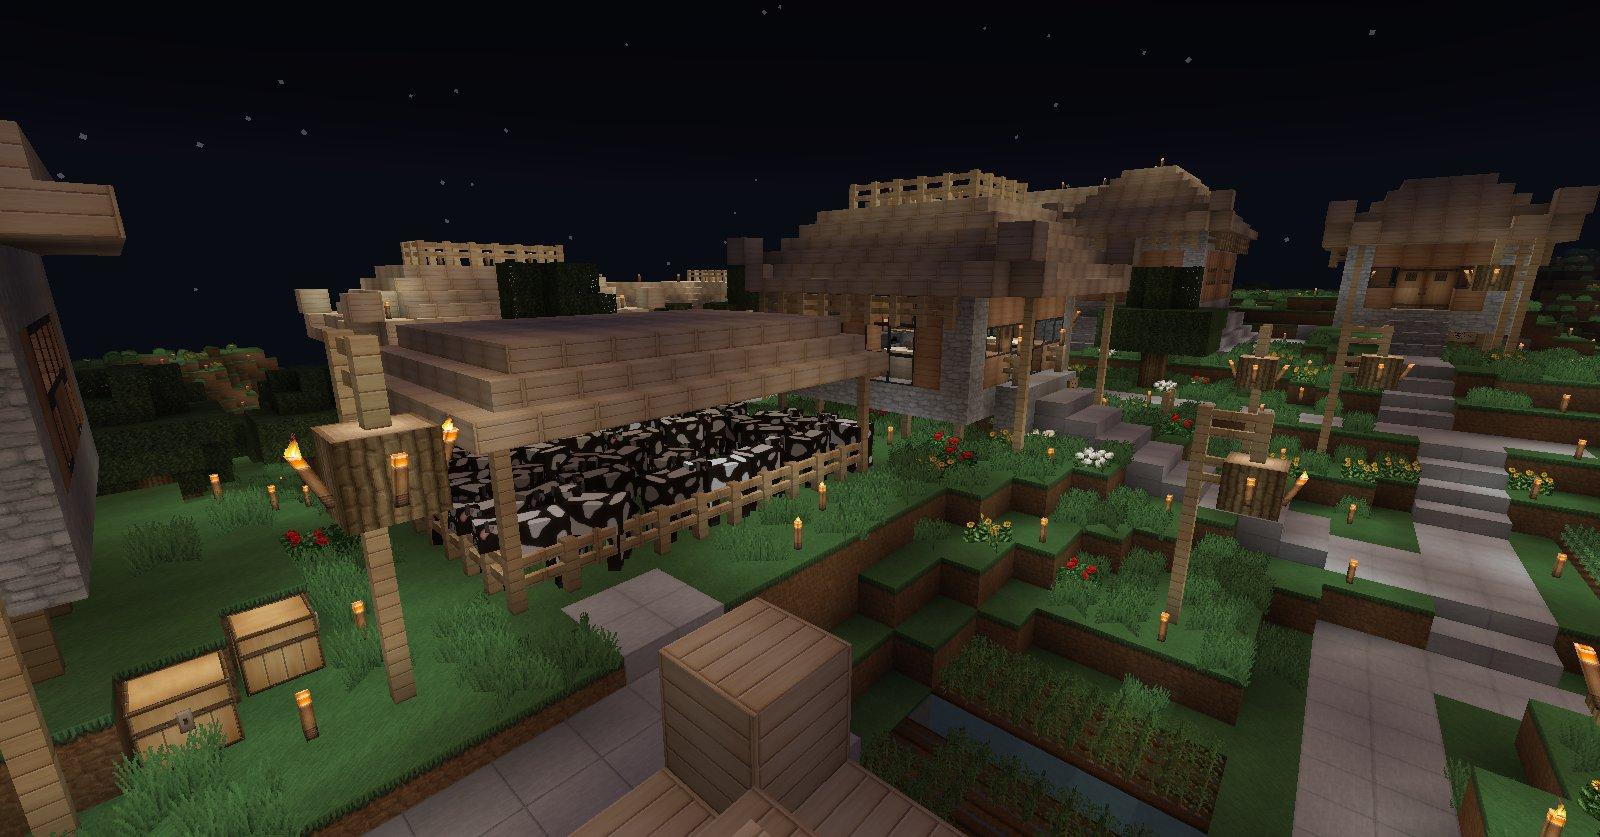 Projet village asiatique. 22b784f1-e005-44dd-917b-391ff22ce6e1